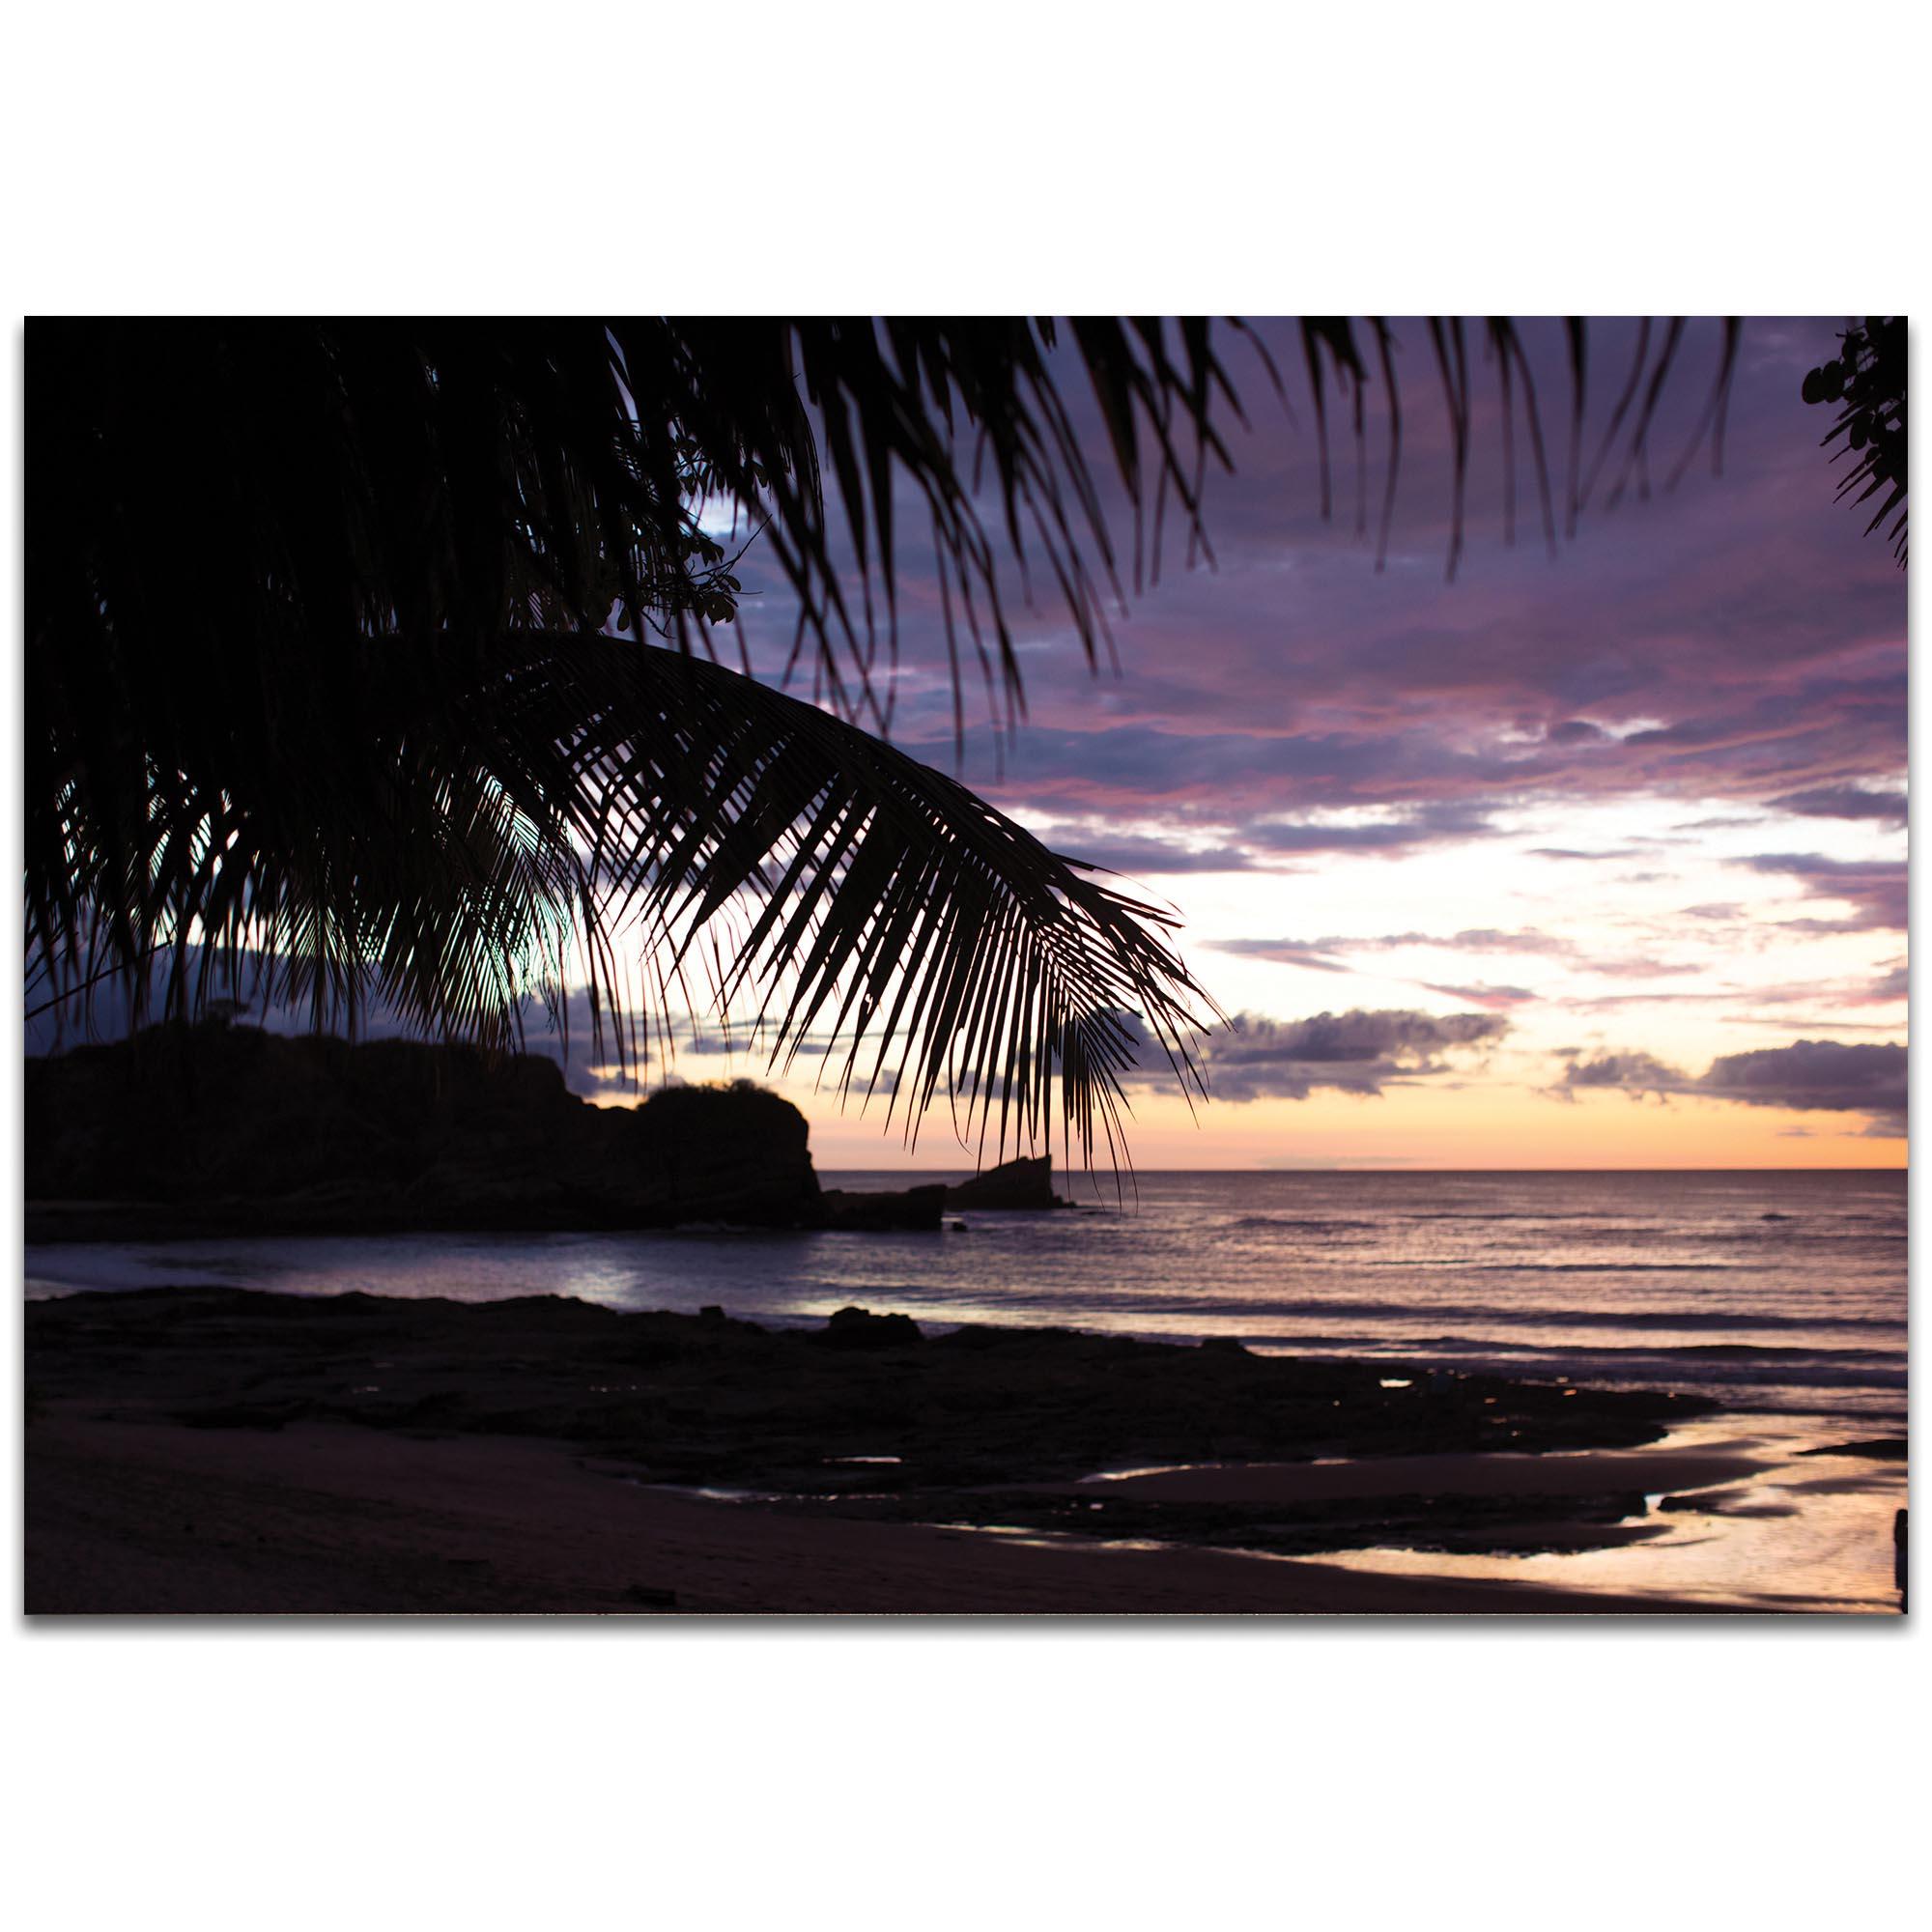 Coastal Wall Art 'Sunset Palms' - Beach Sunset Decor on Metal or Plexiglass